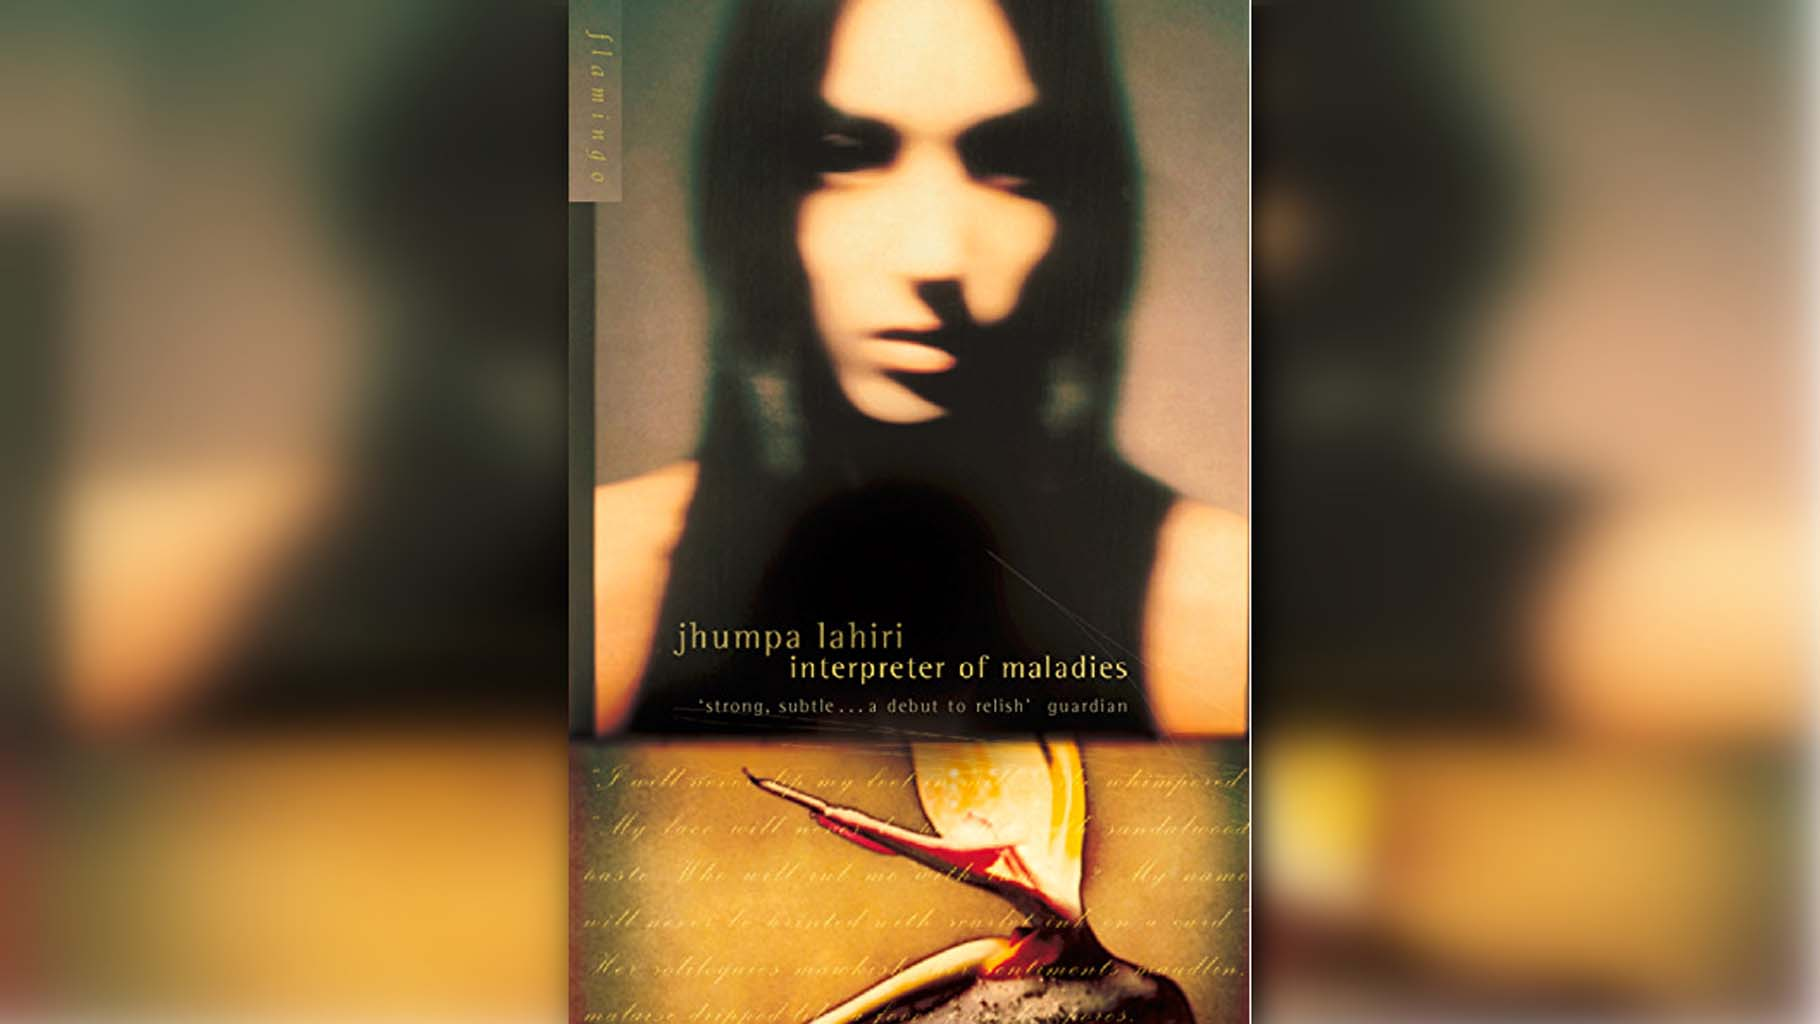 Short Stories, Pulitzer, Interpreter of maladies, Jhumpa Lahiri